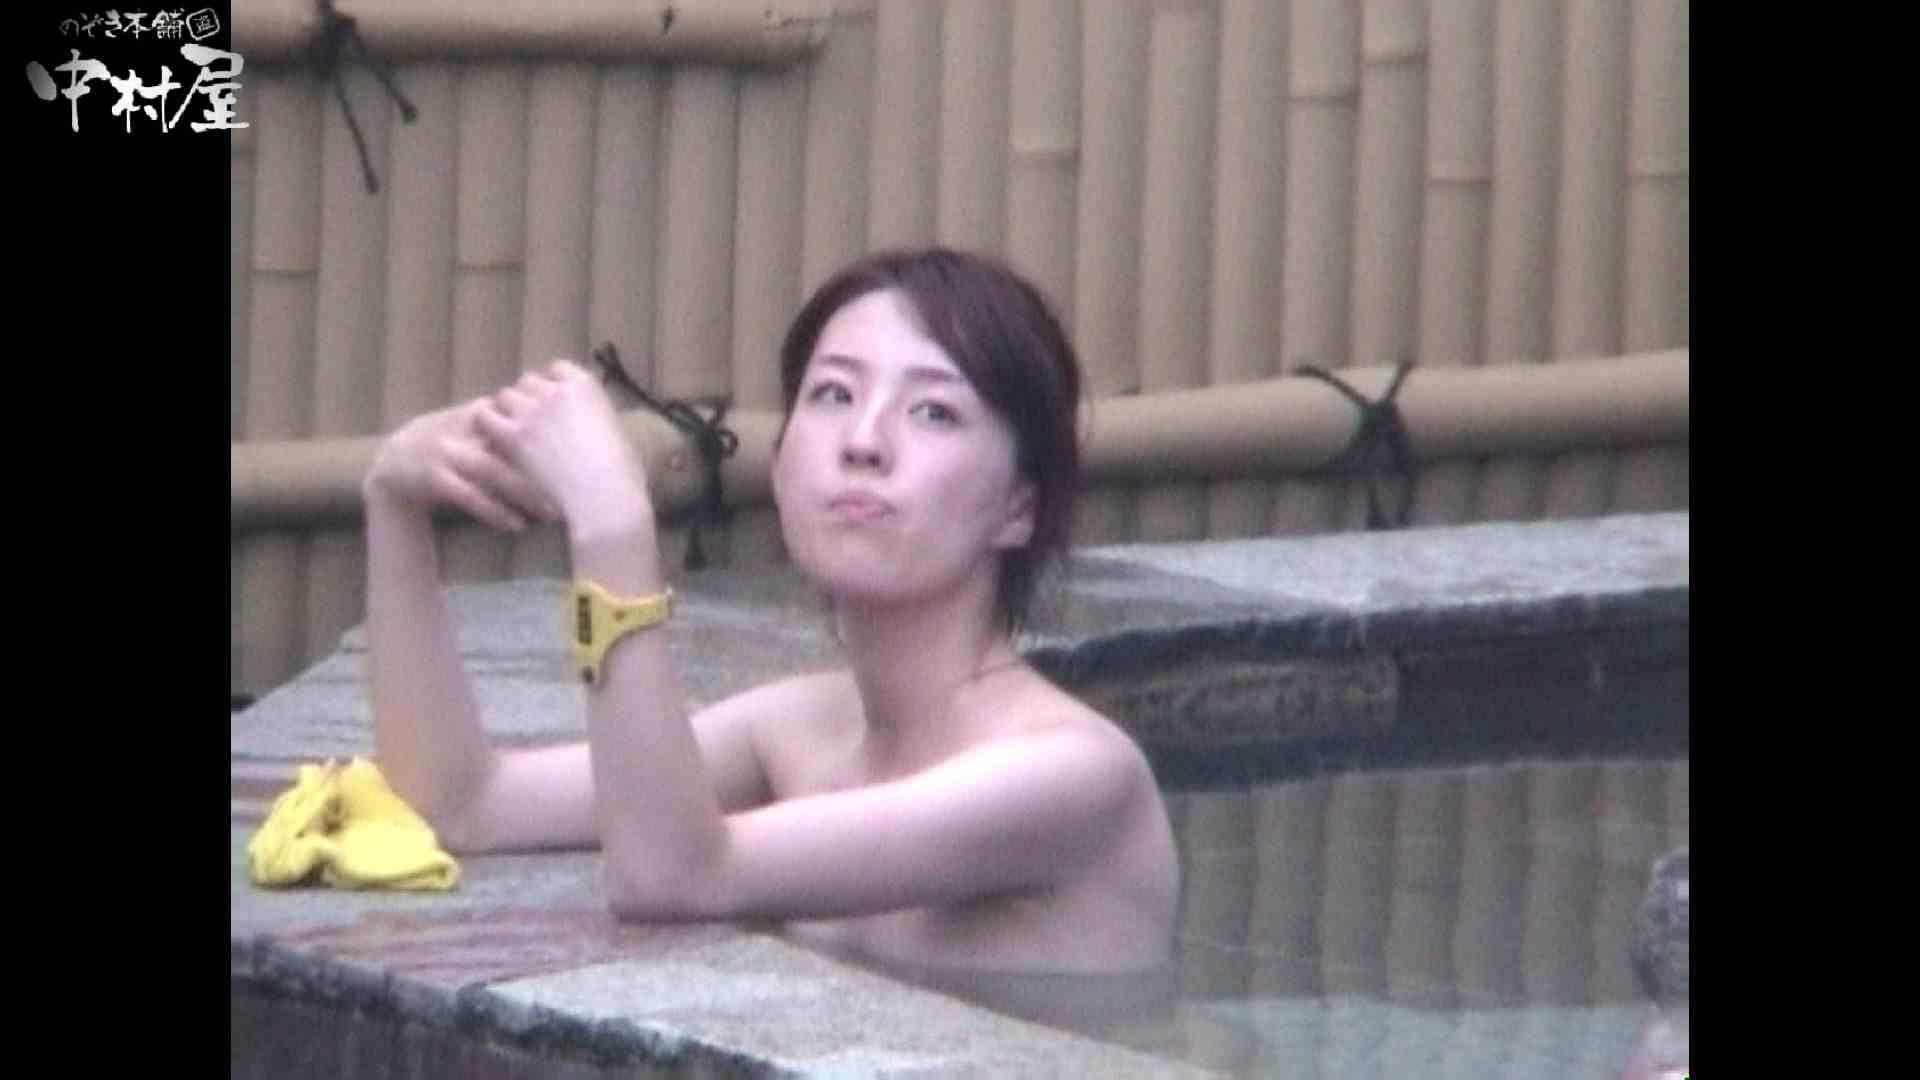 Aquaな露天風呂Vol.964 綺麗なOLたち オメコ無修正動画無料 97枚 50